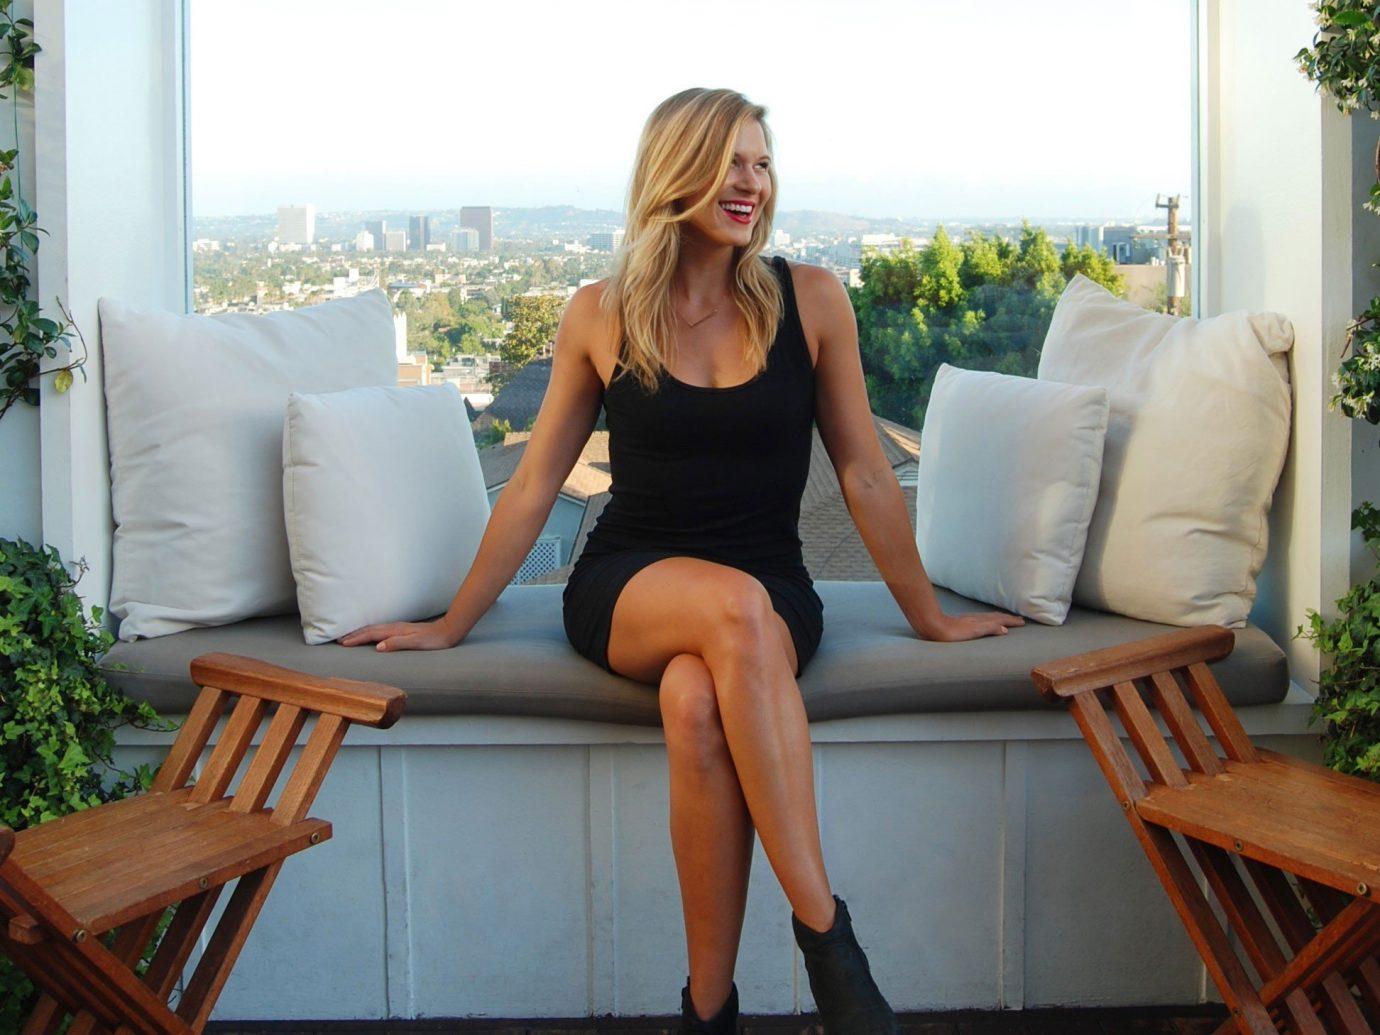 Hotels floor person woman sitting hair clothing human positions blond leg long hair brown hair photo shoot furniture